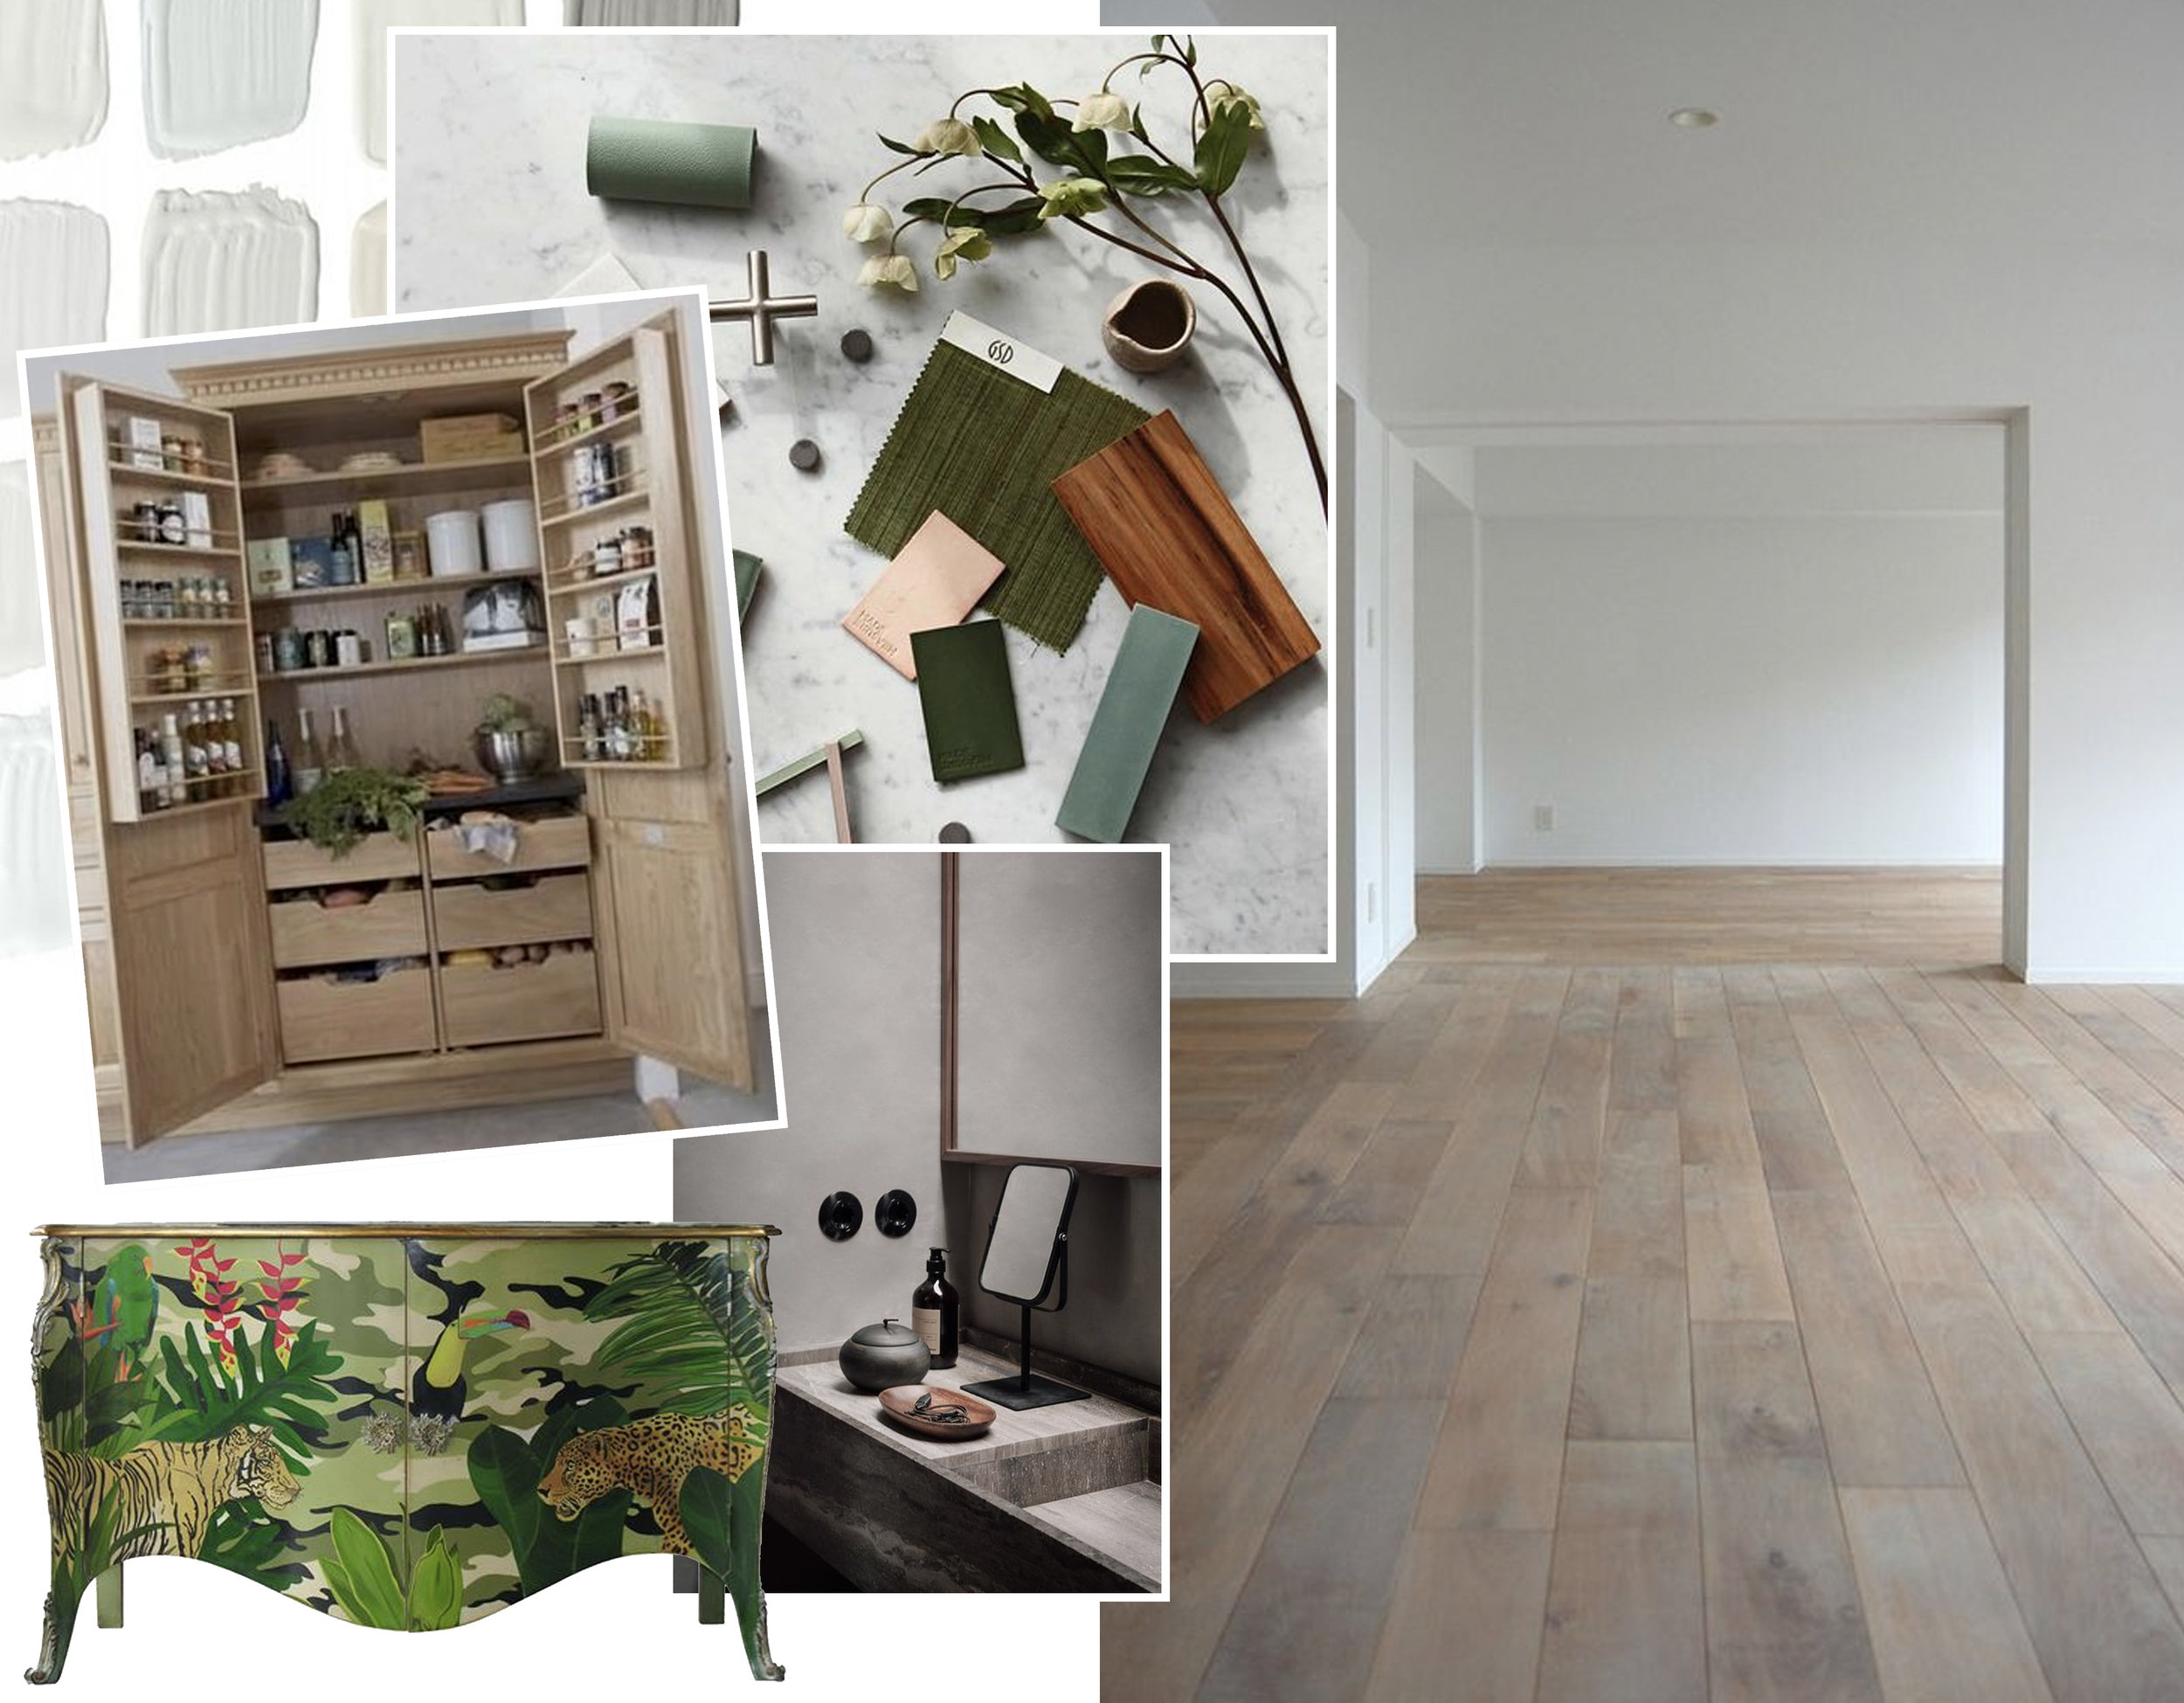 materials via  Instagram  - kitchen cabinet  Pinterest  - buffet  Moissonnier  - empty room via  Plastolux